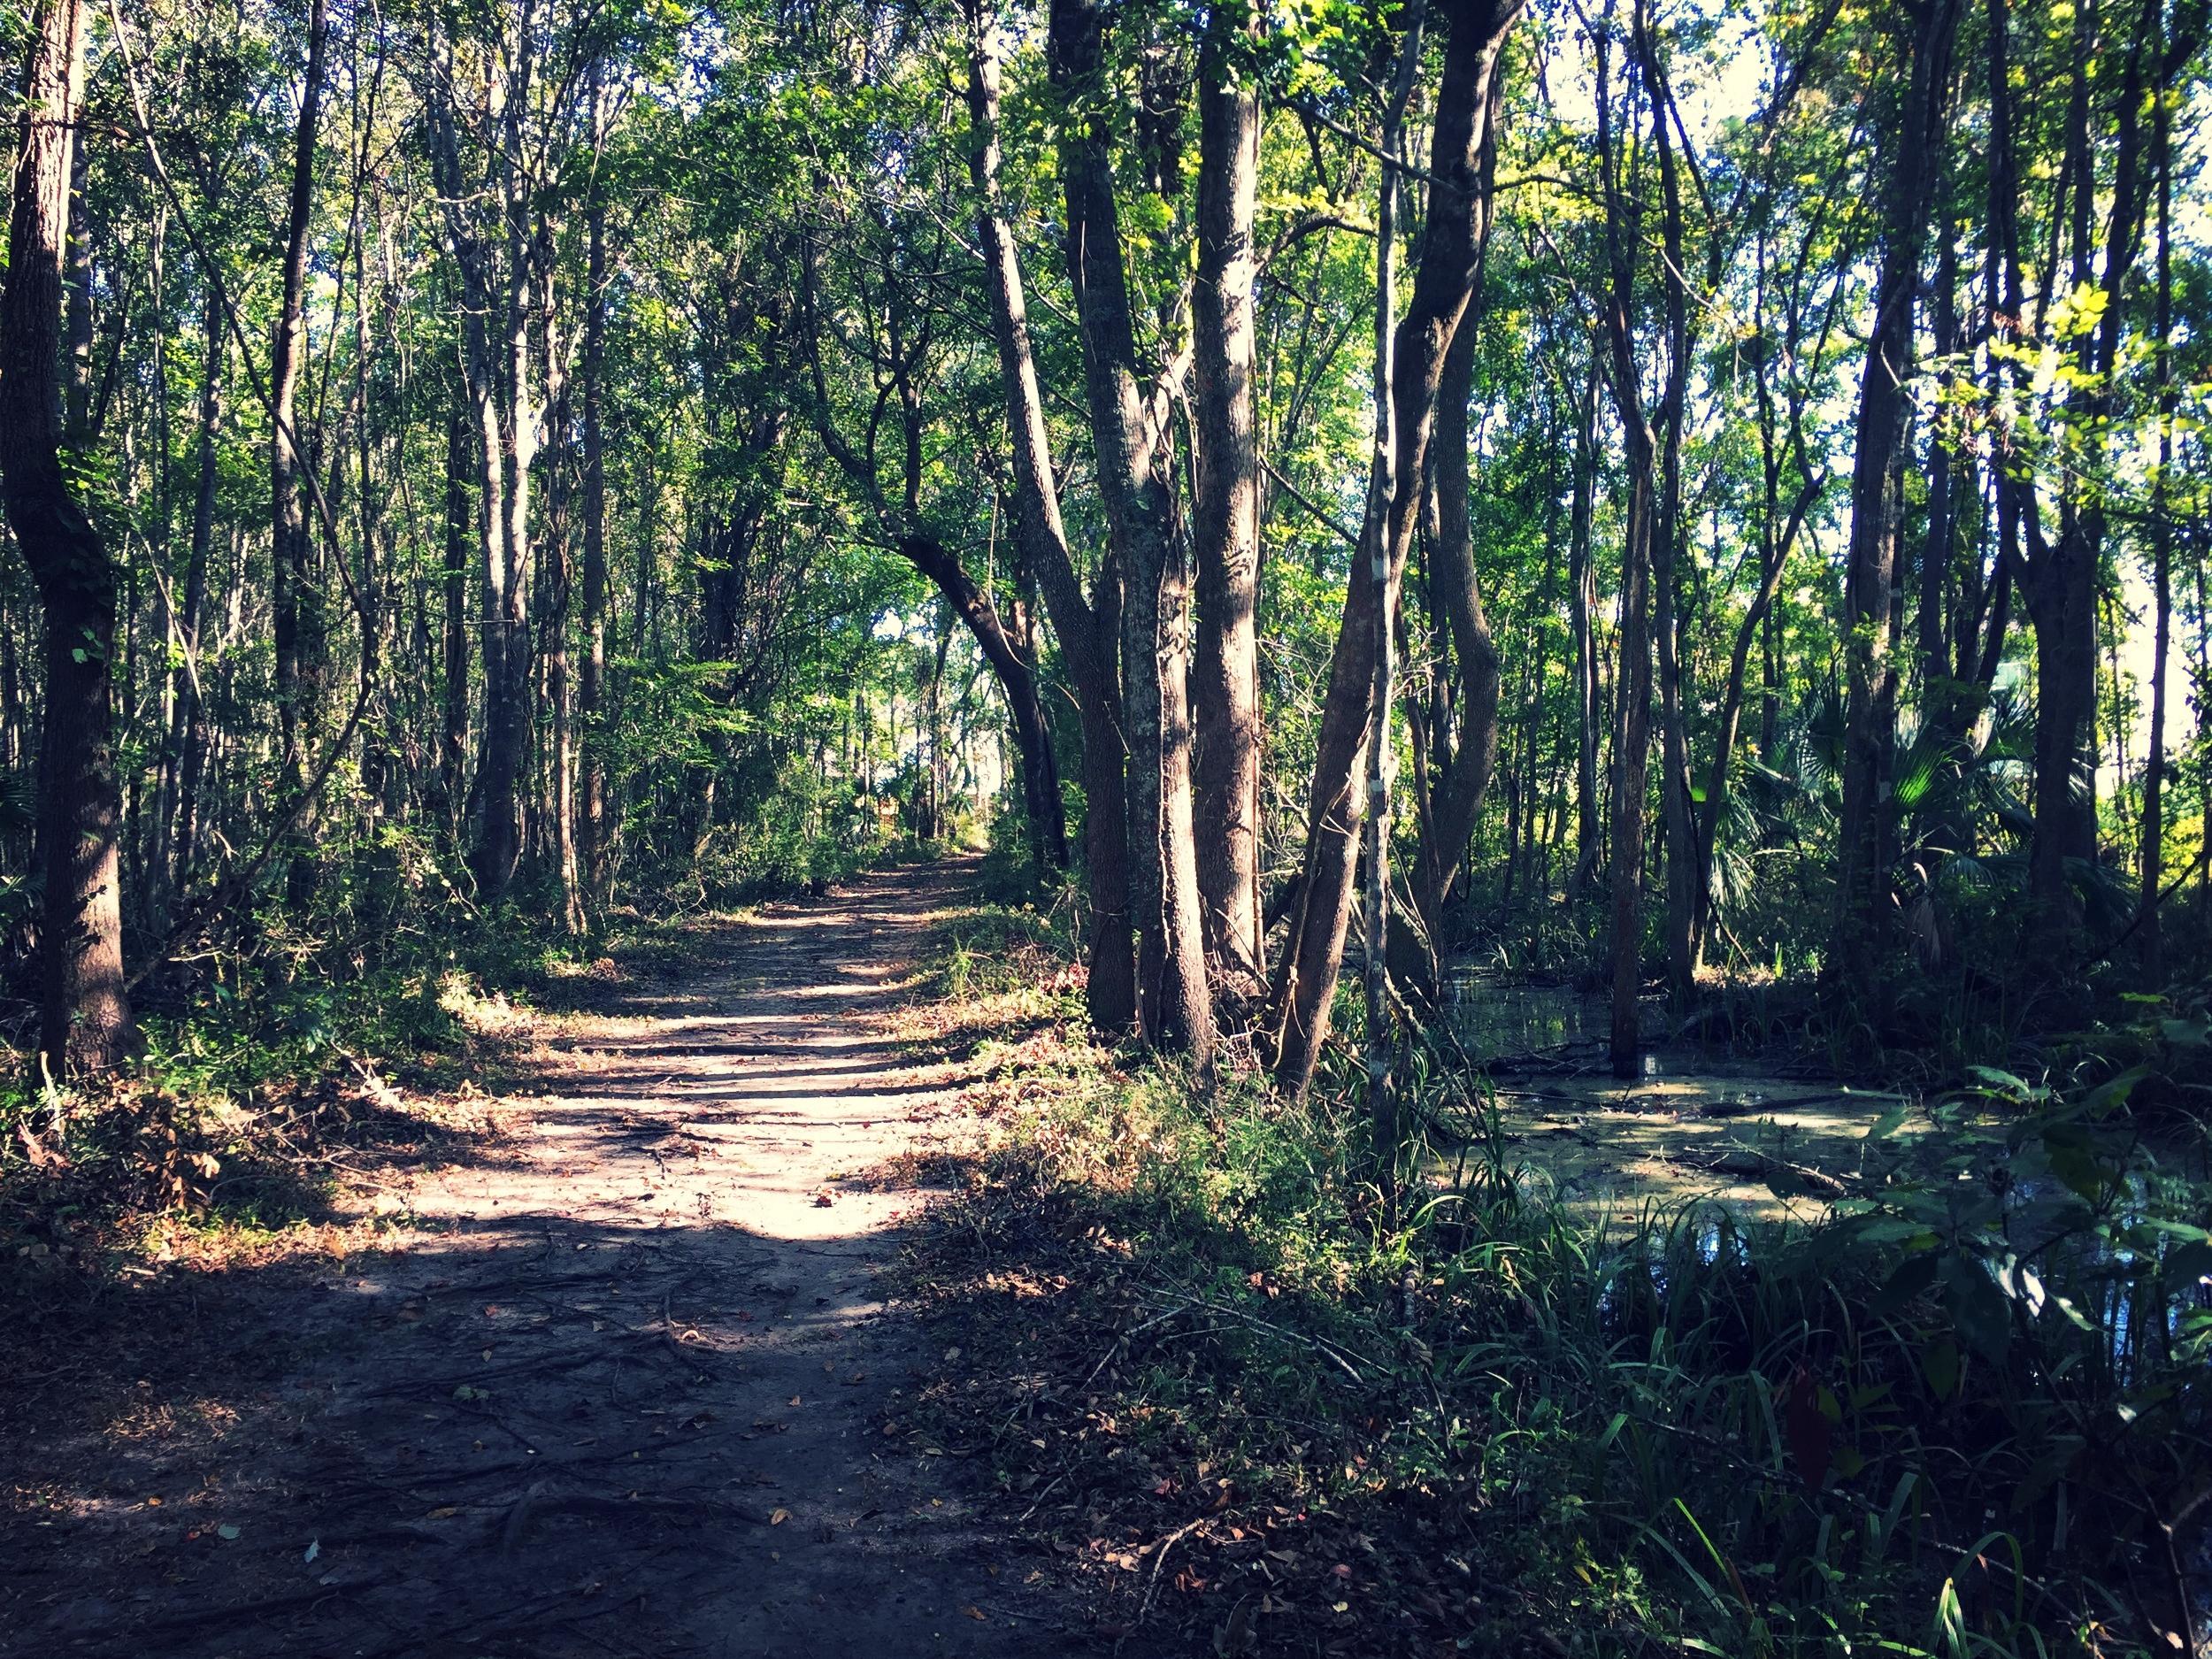 Neighborhood trails